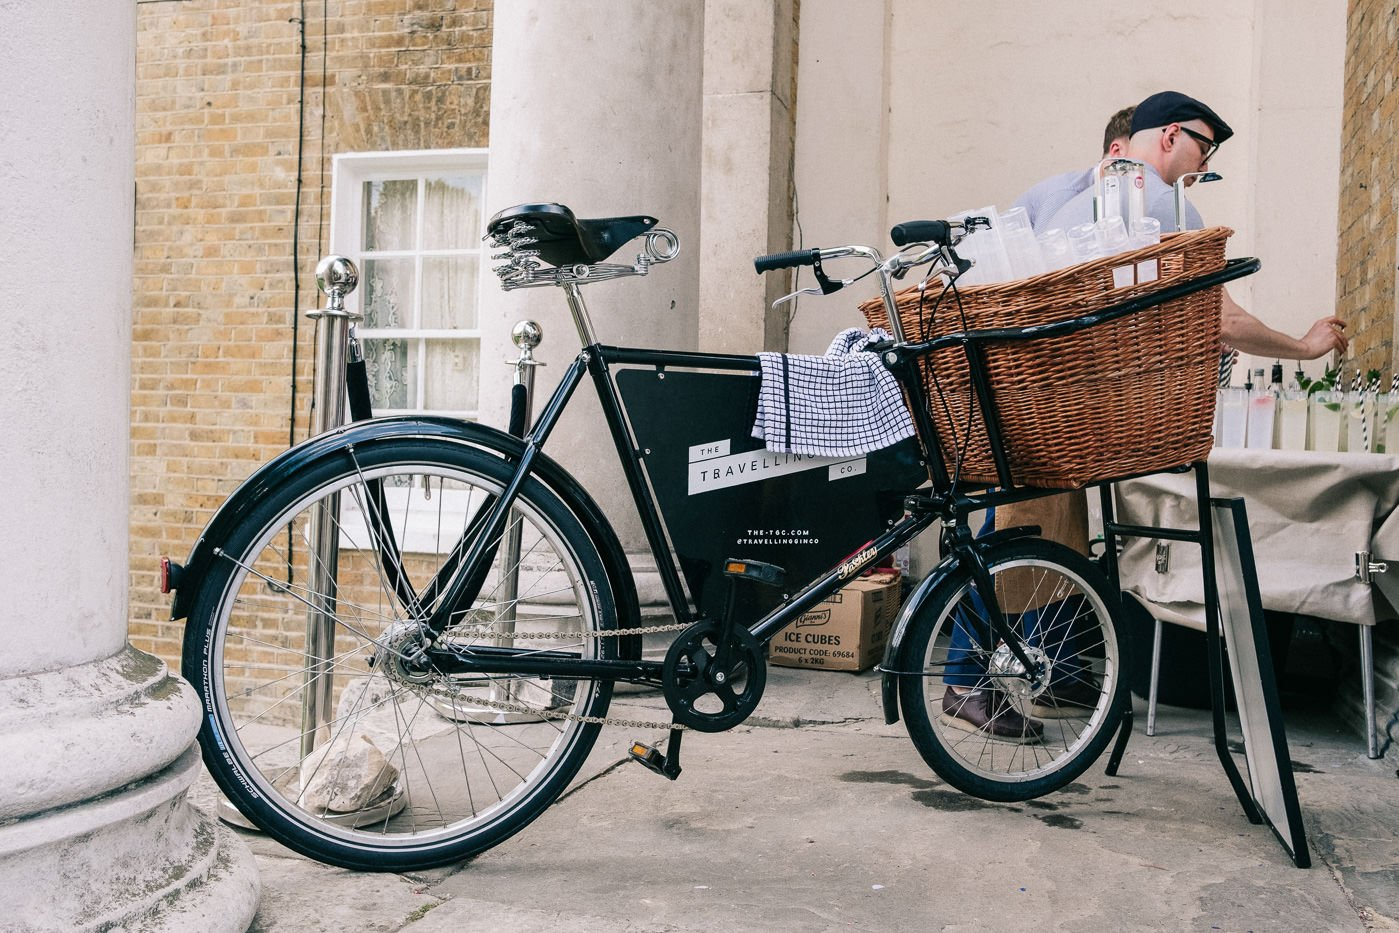 travelling gin bike asylum peckham